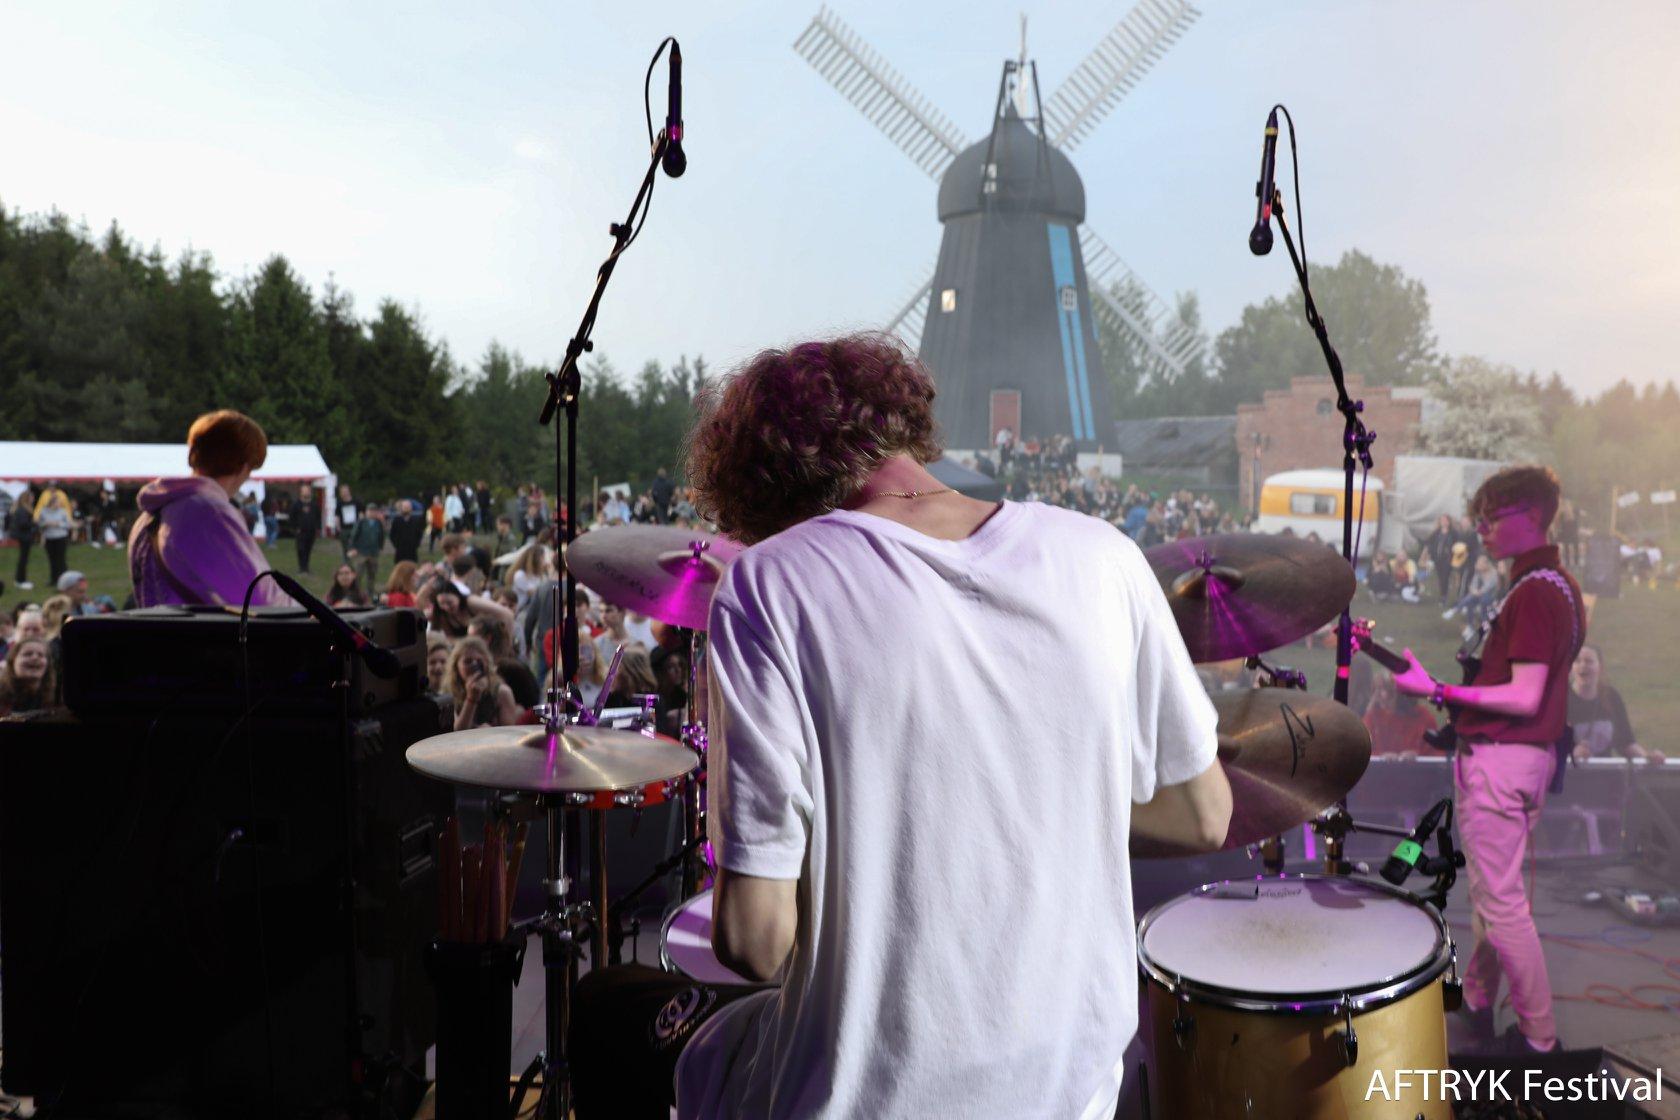 Efterskolens musikfestival AFTRYK